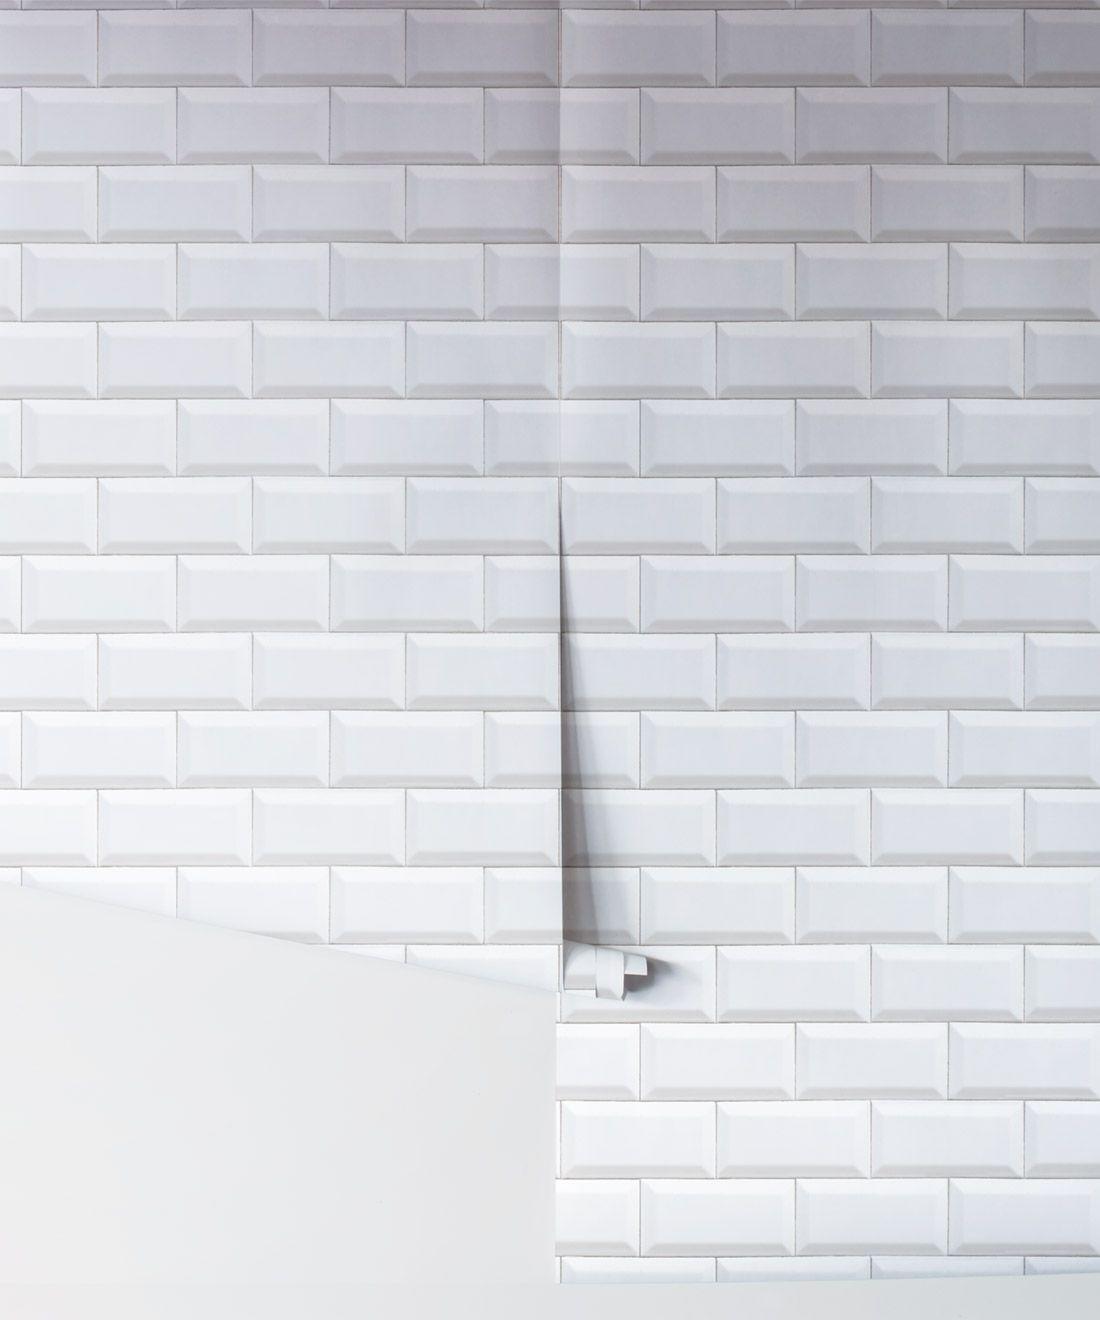 White Subway Tiles Wallpaper • Minimal Wallpaper • Milton ...